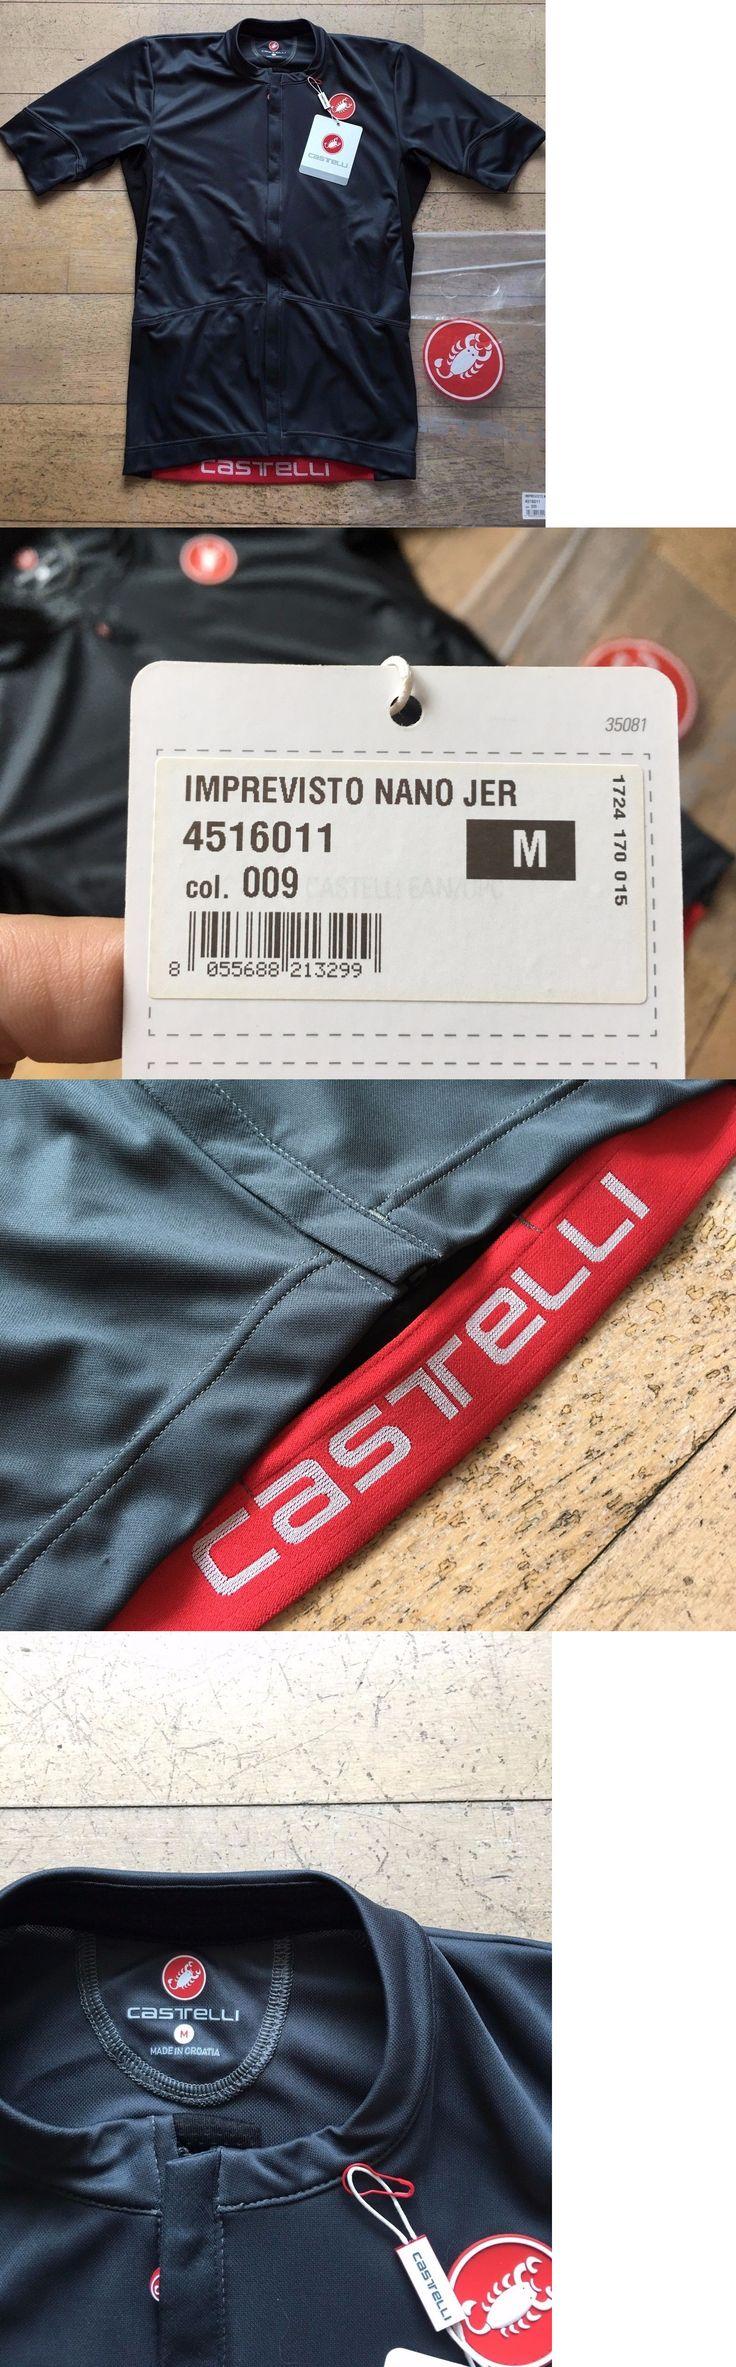 Jerseys 56183: New Castelli Imprevisto Nano Jersey Road Cyclocross Bike - Size Medium - Black -> BUY IT NOW ONLY: $69.95 on eBay!